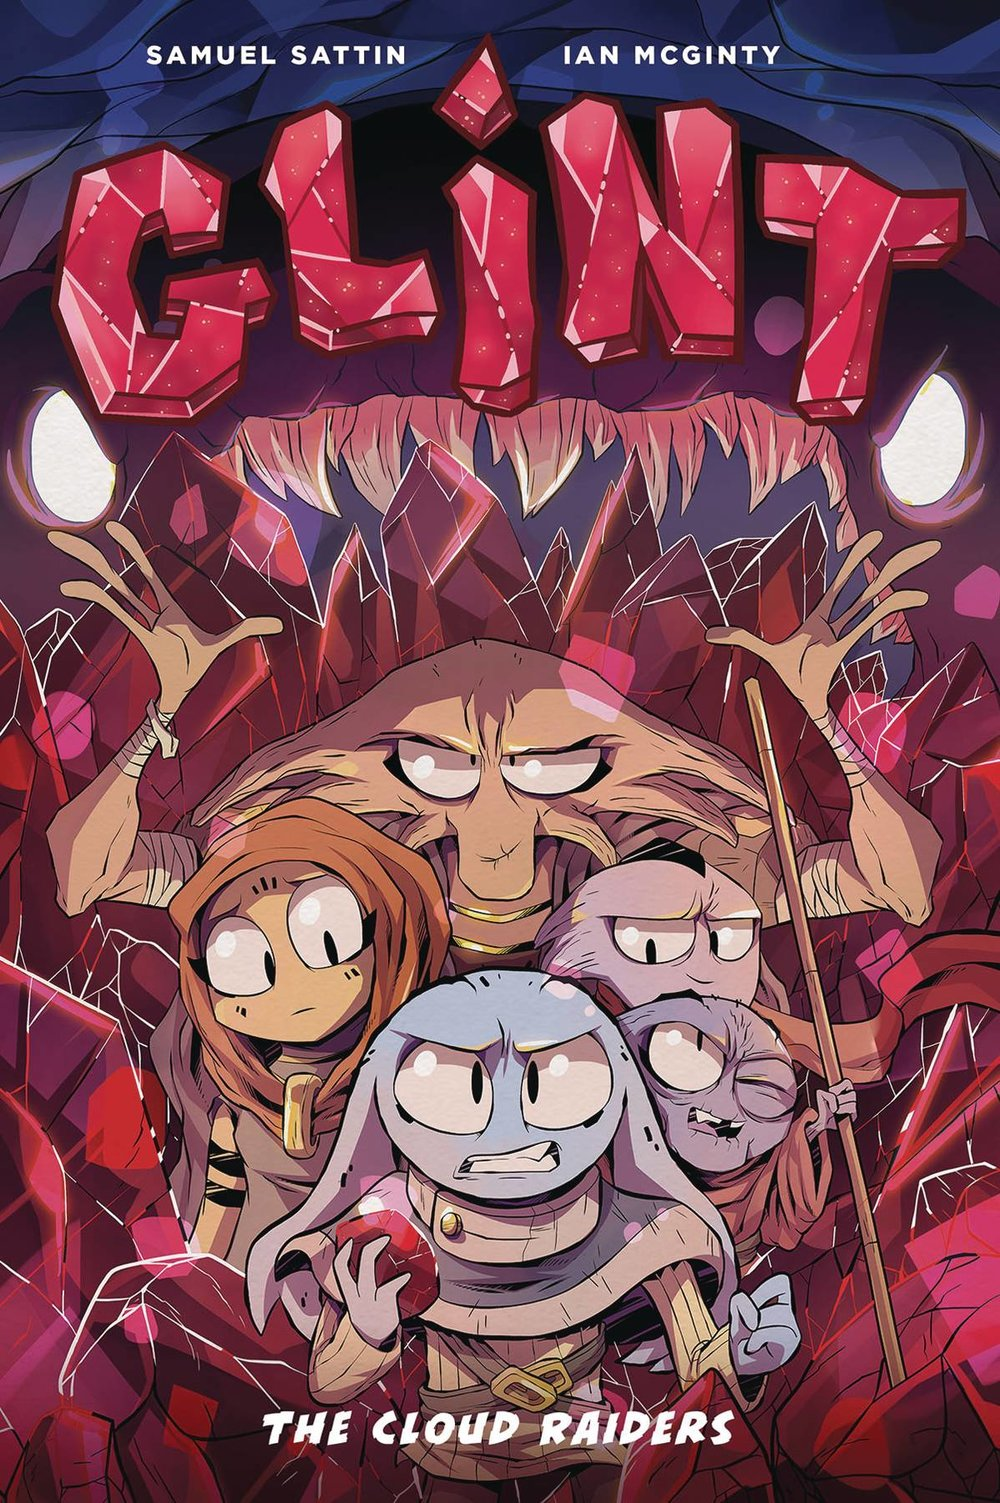 GLINT GN BOOK 01 CLOUD RAIDERS